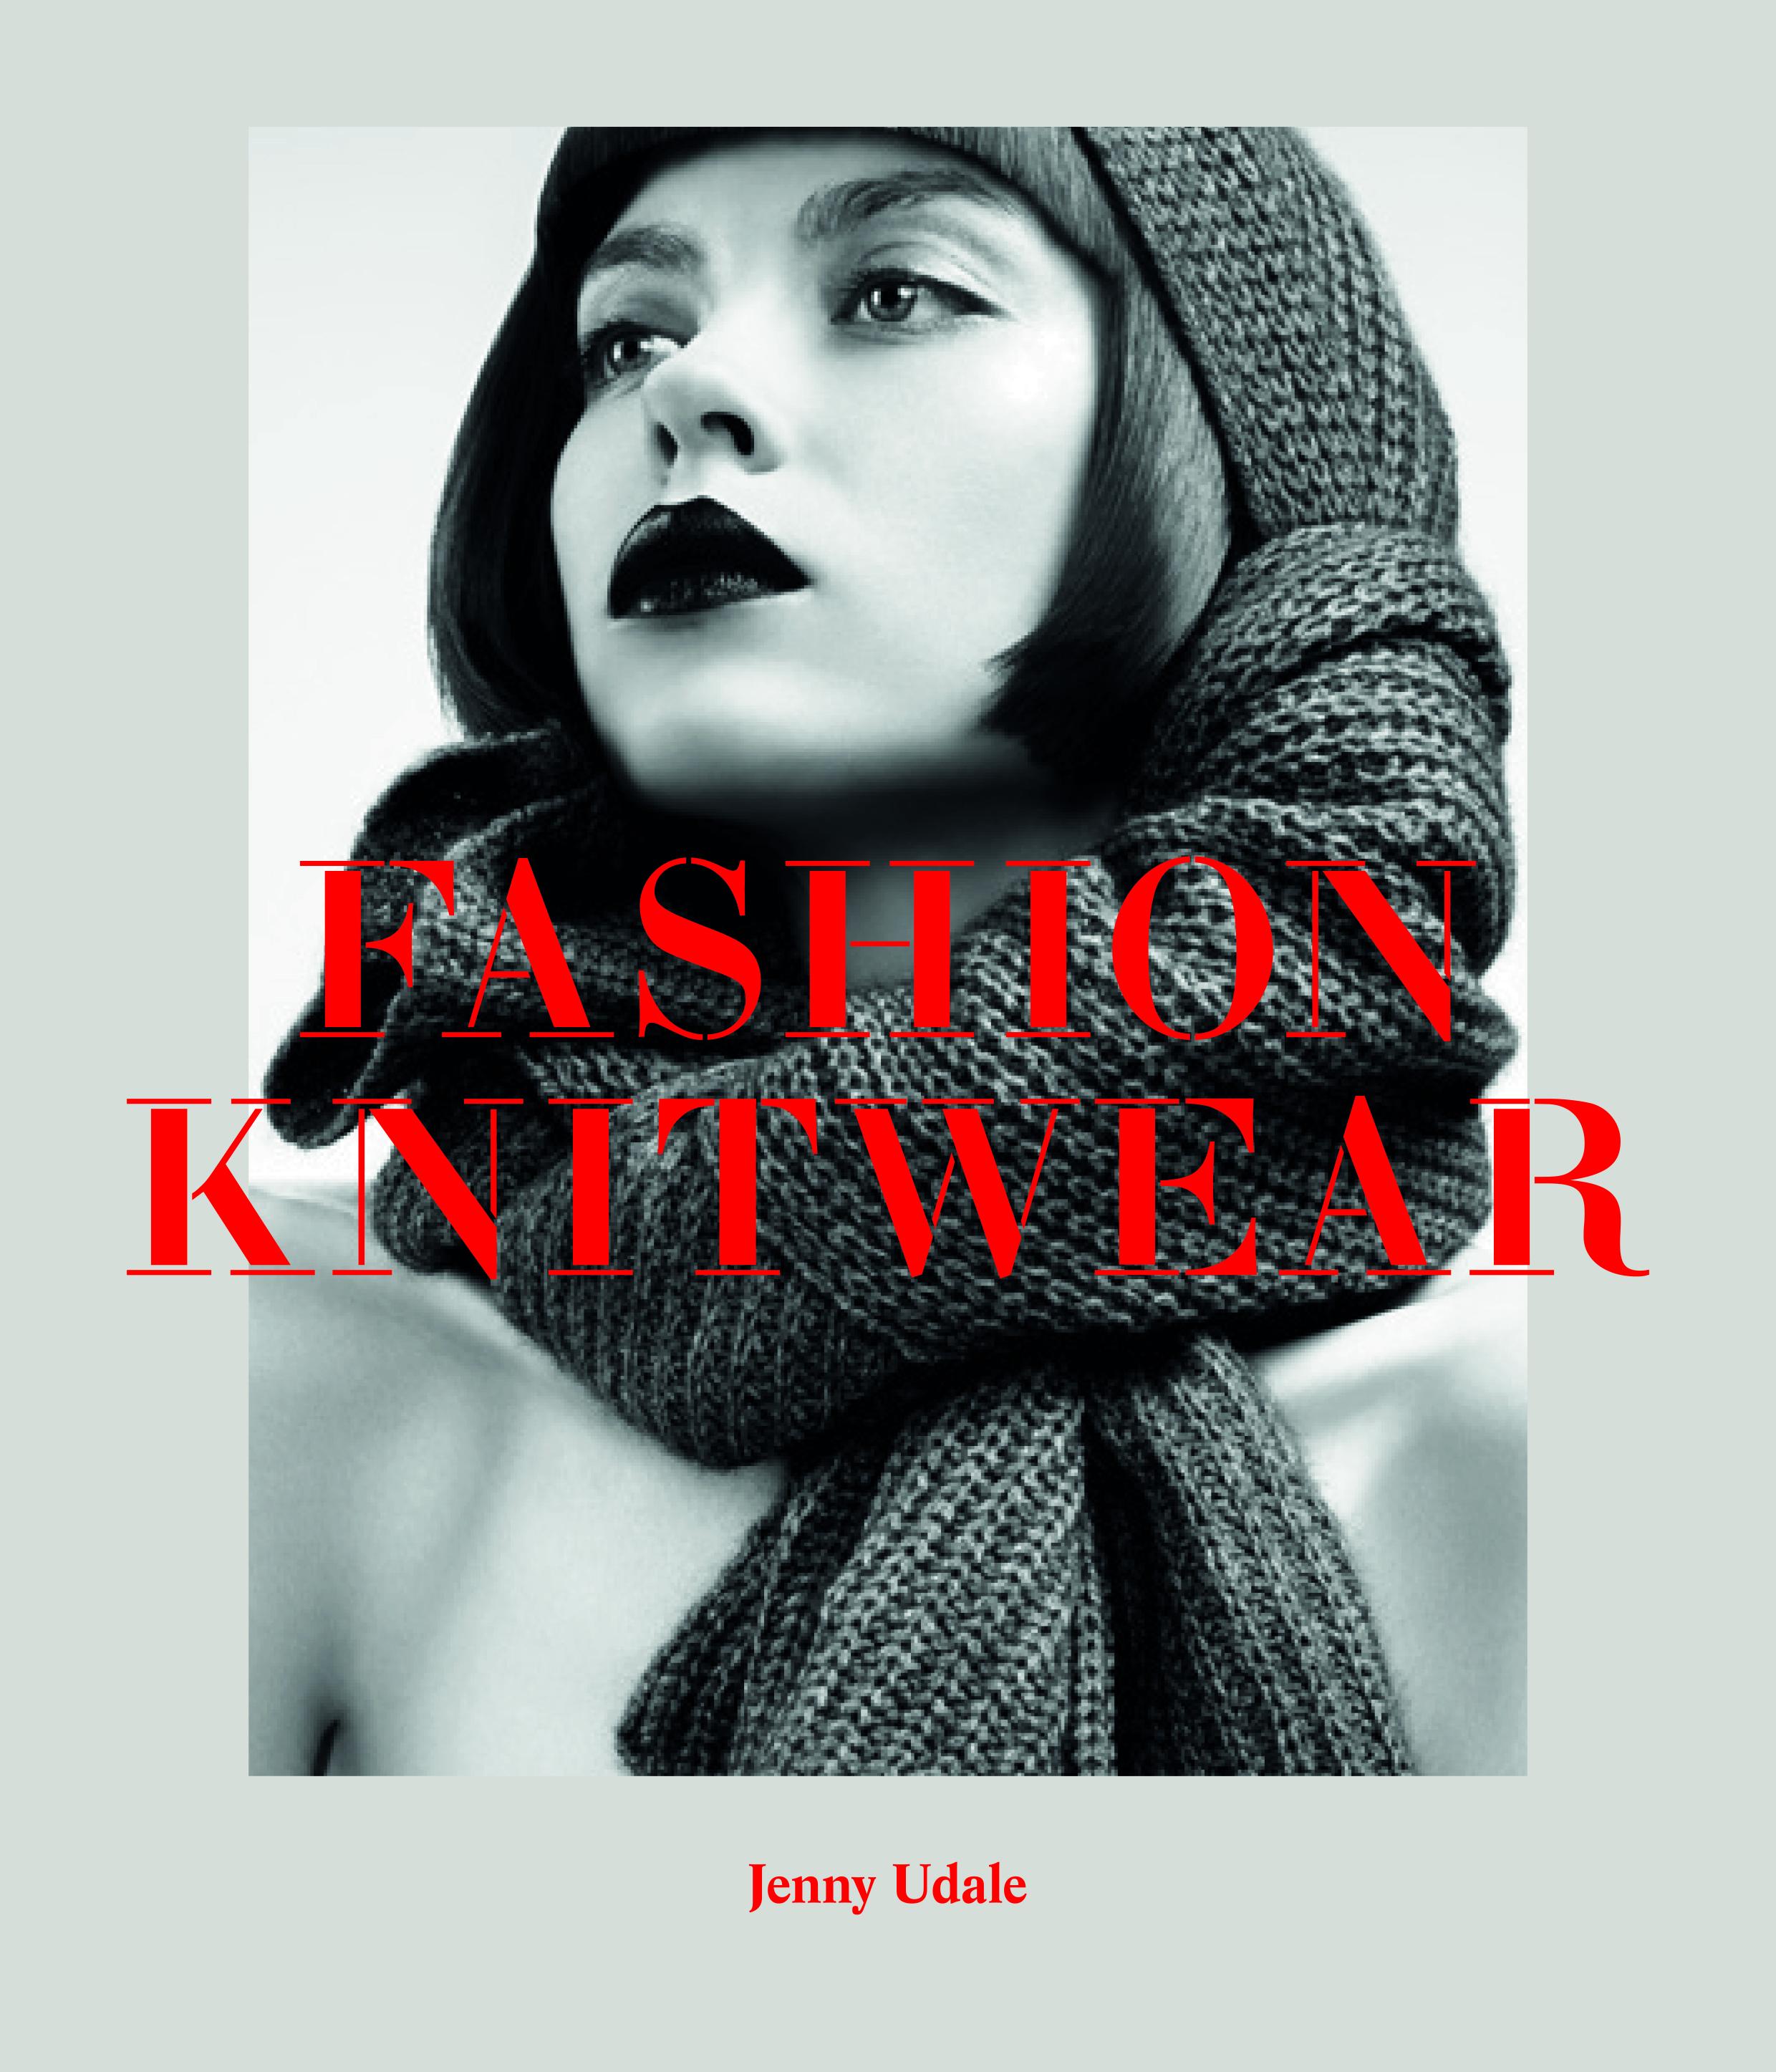 Fashion Knitwear | Jenny Udale | April 2014